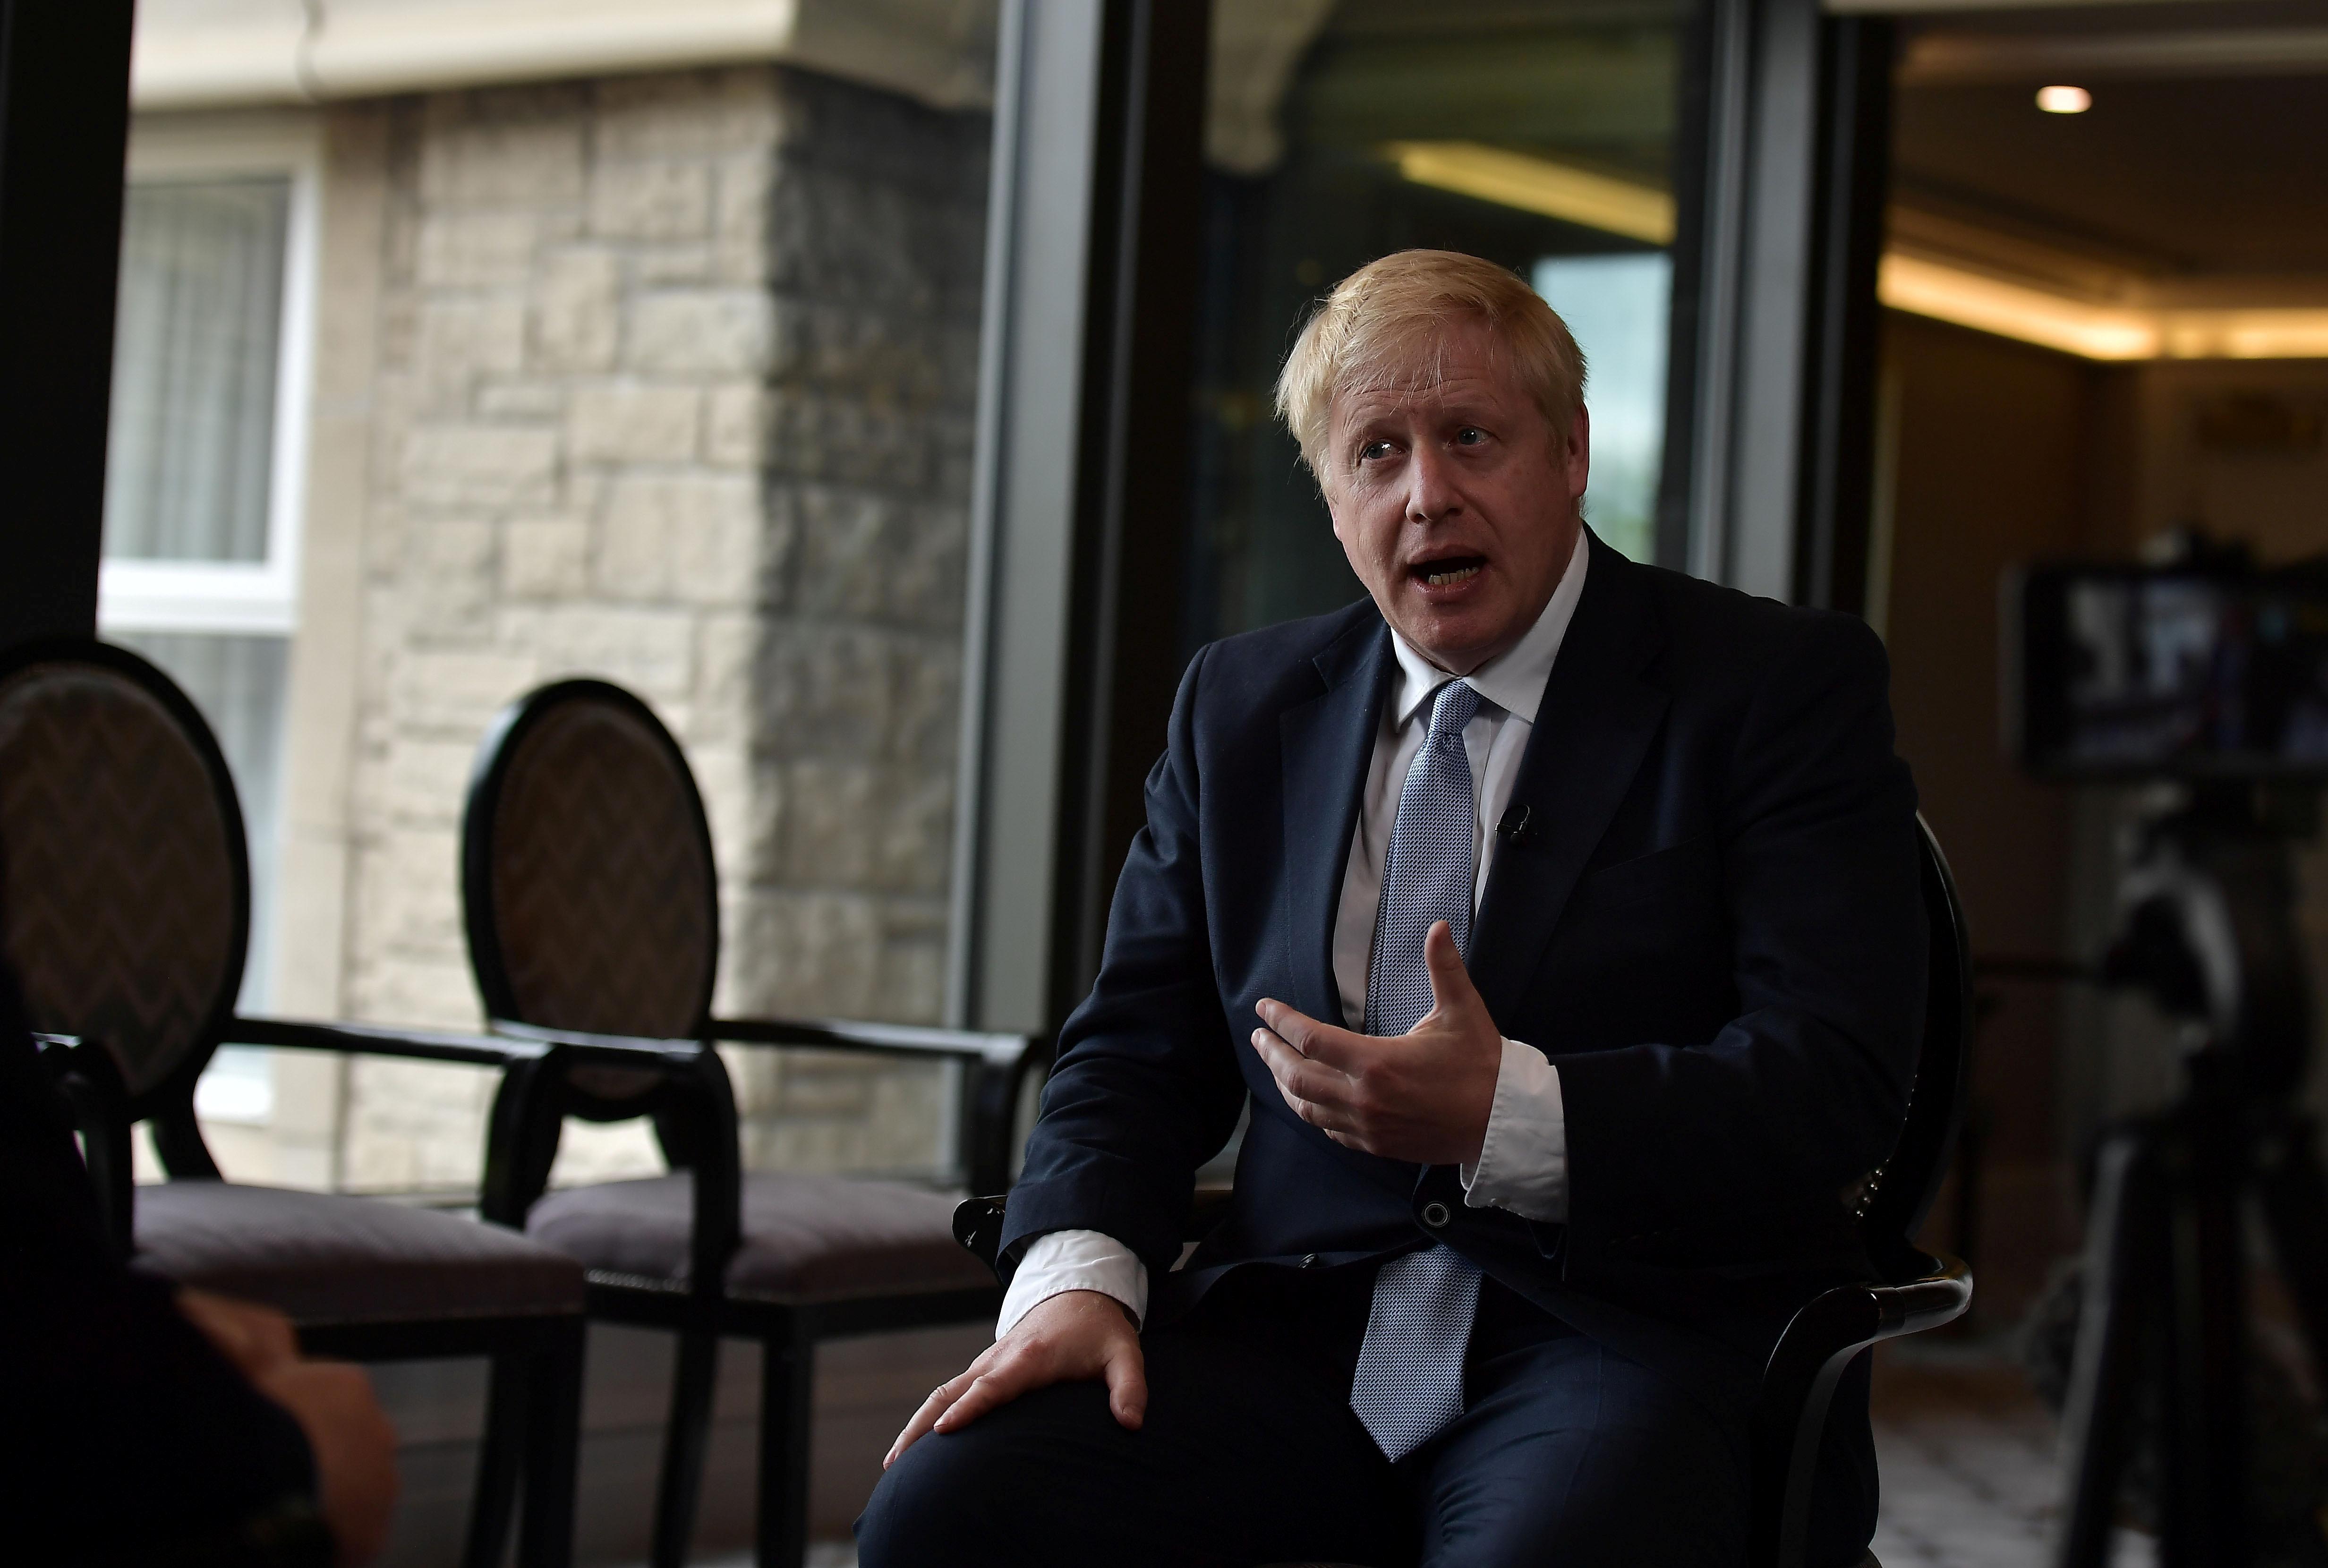 UK's Boris Johnson: I am like a lightsaber-wielding Jedi Knight